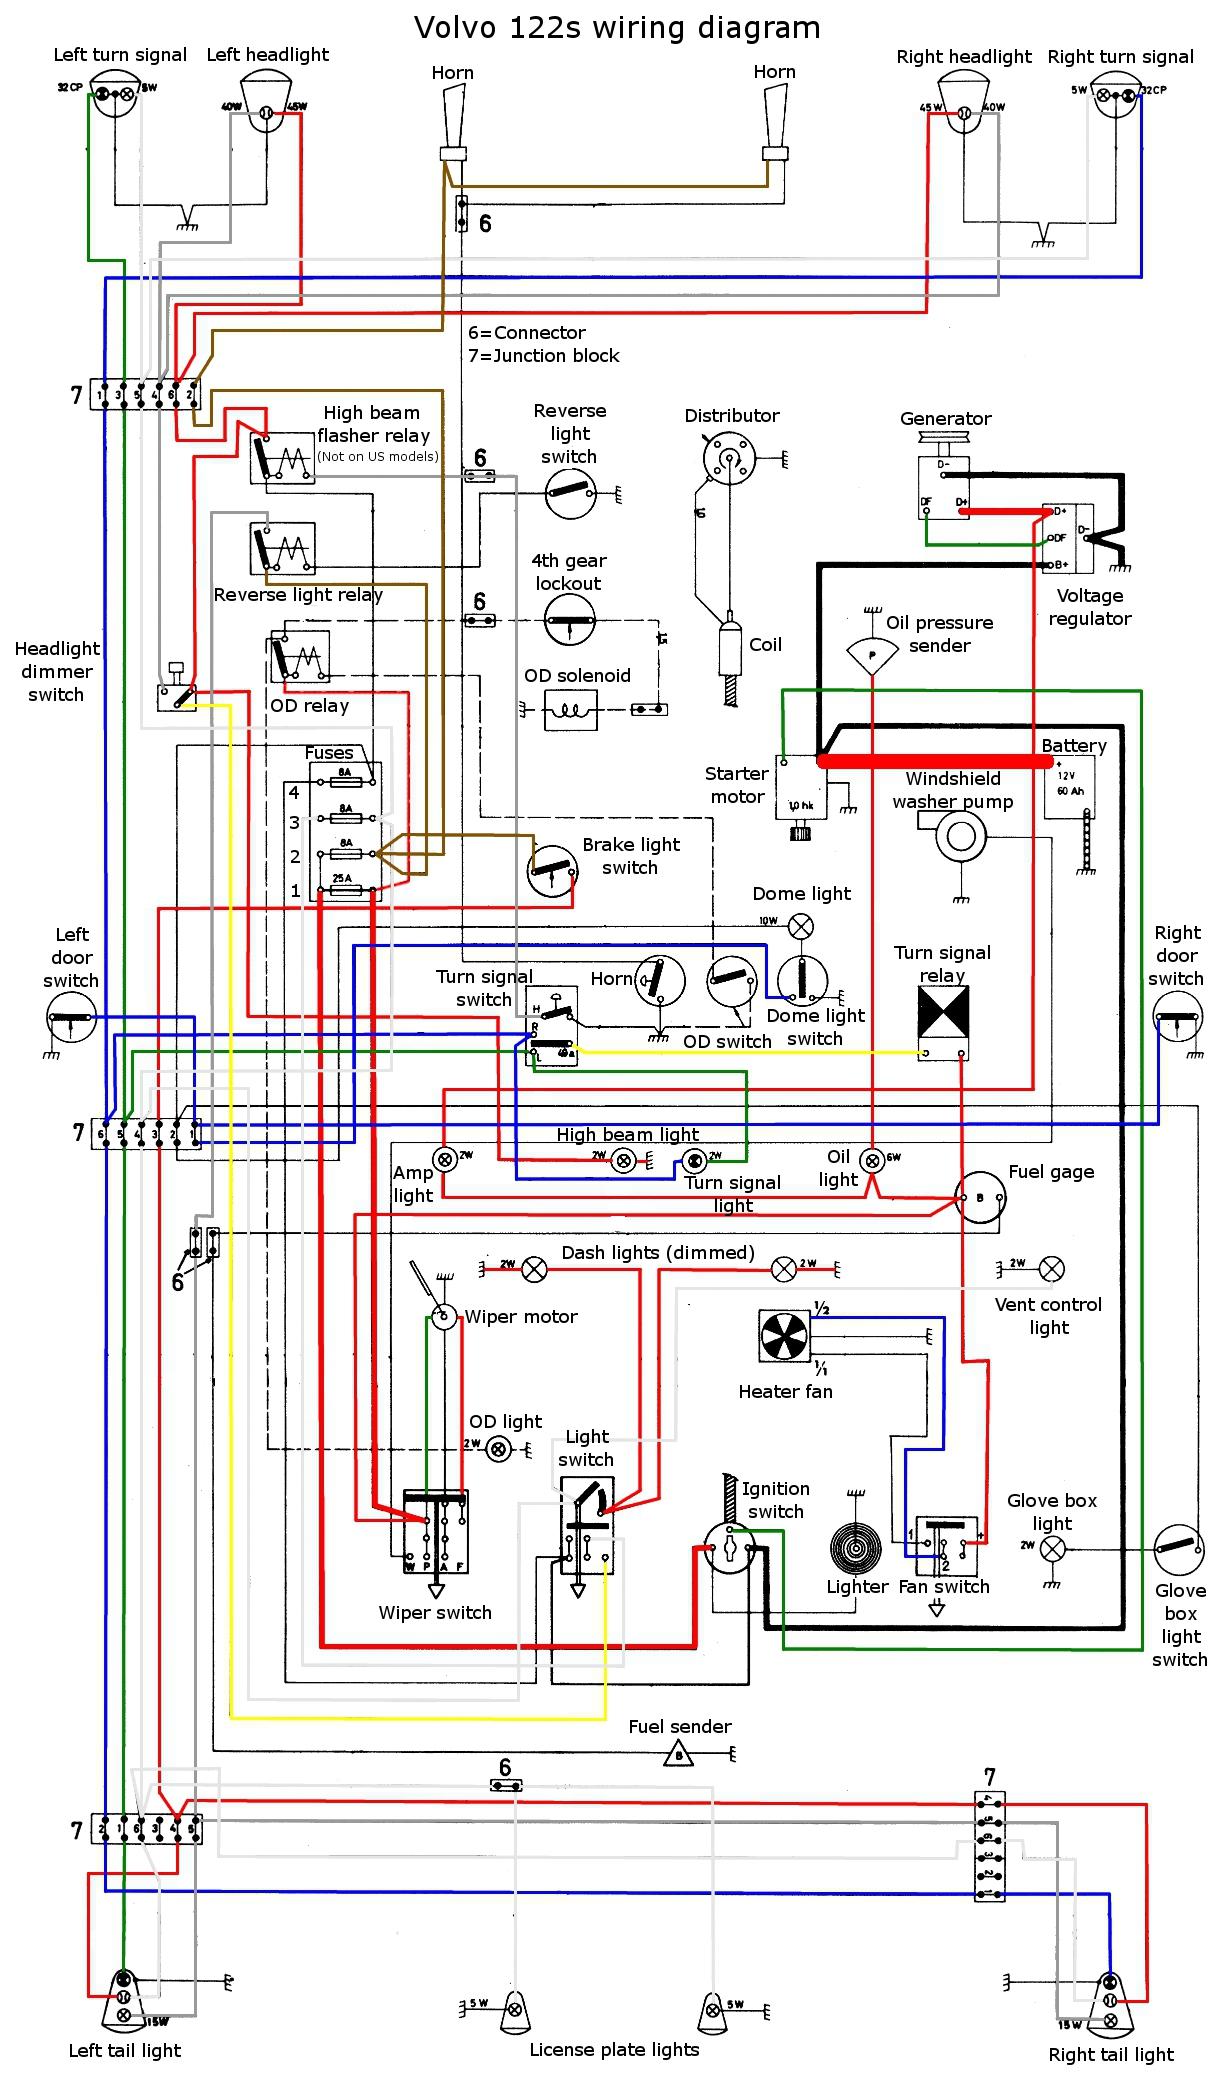 122 wiring diagram color?resize\\\\\\\\\\\\\\\=1227%2C2074 volvo wiring diagrams s60 gandul 45 77 79 119 pc9-401 wiring diagram at n-0.co